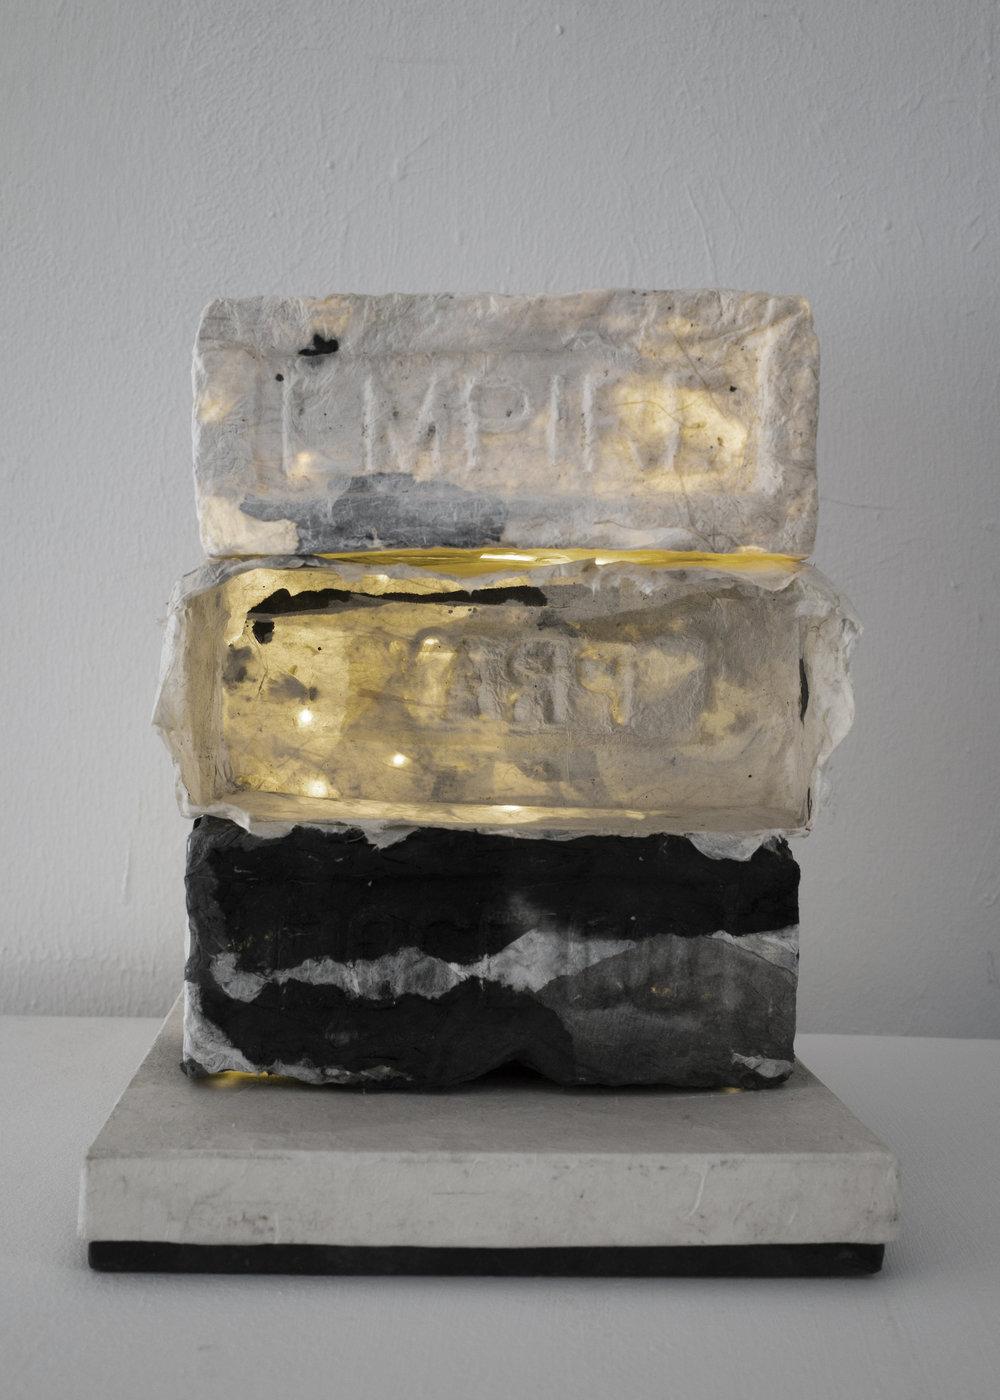 Lin Yan,  Sparse Dream in Brooklyn   疏梦-布鲁克林 , 2015. Xuan paper, ink and string lights. 12 x 9 x 9 in. (30 x 23 x 23 cm) ©2017 Lin Yan, Courtesy Fou Gallery